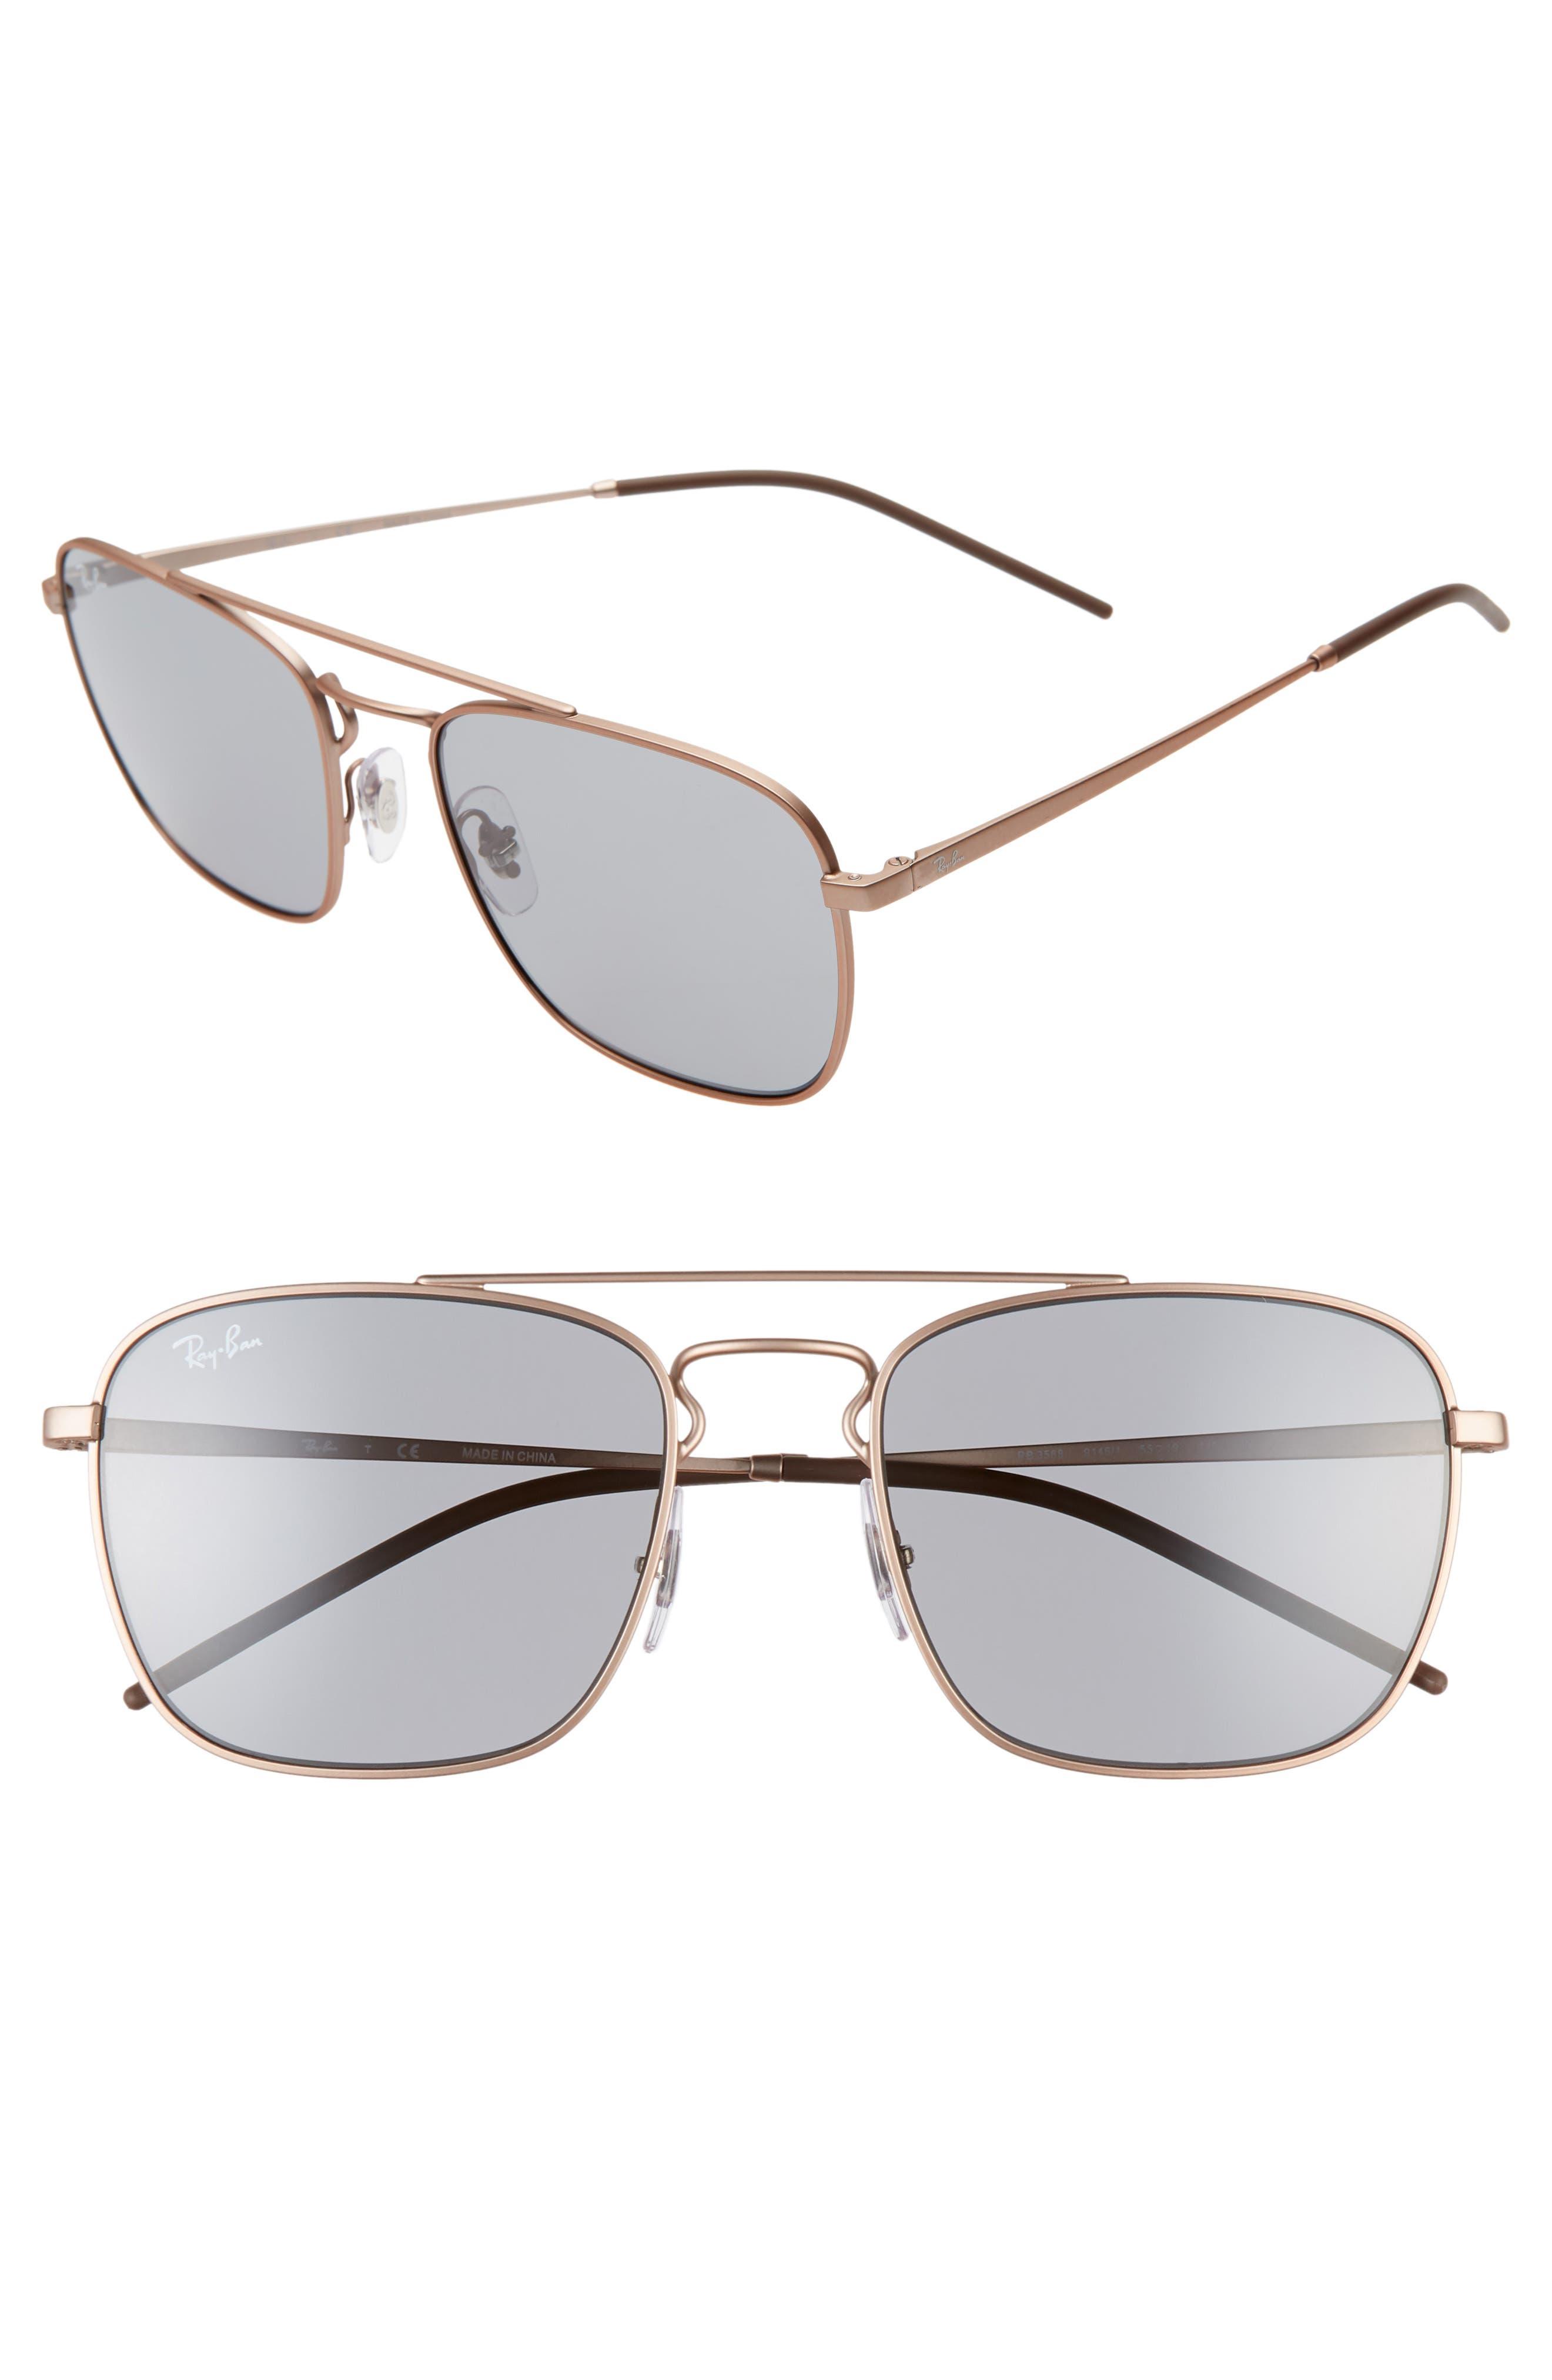 Ray-Ban 55Mm Navigator Sunglasses - Copper/ Grey Solid